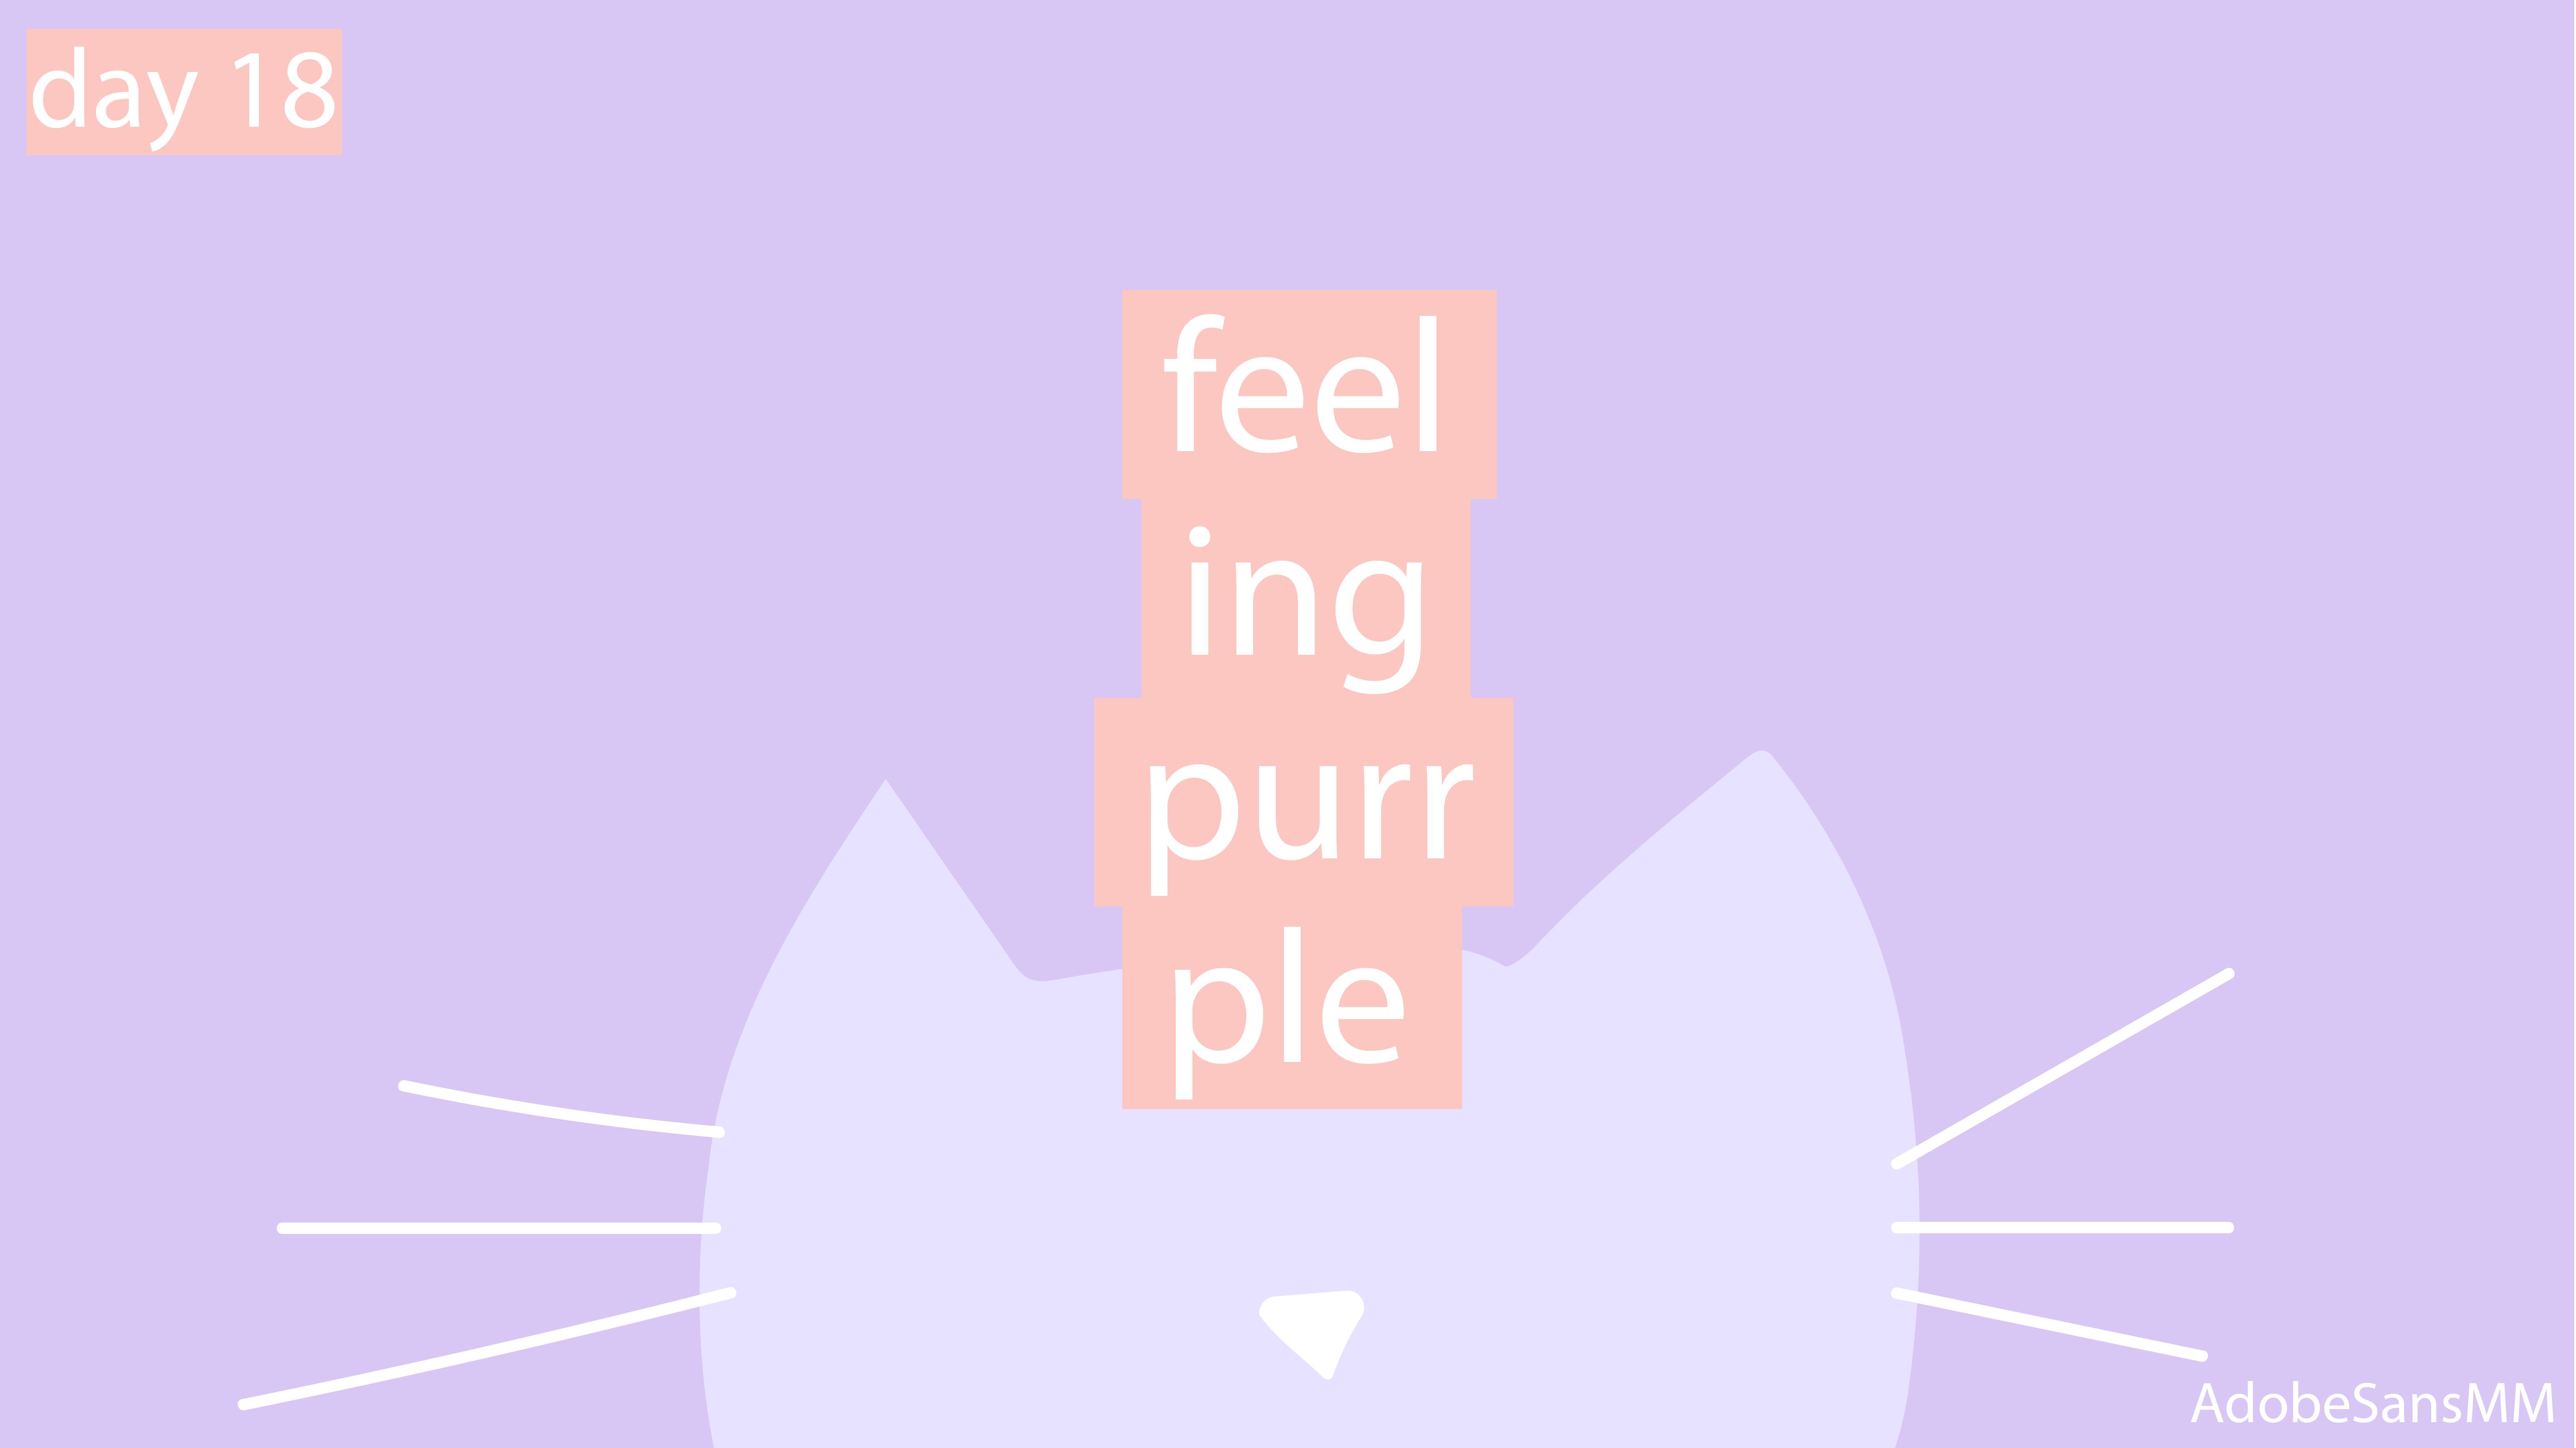 [cat]day1_Artboard 18